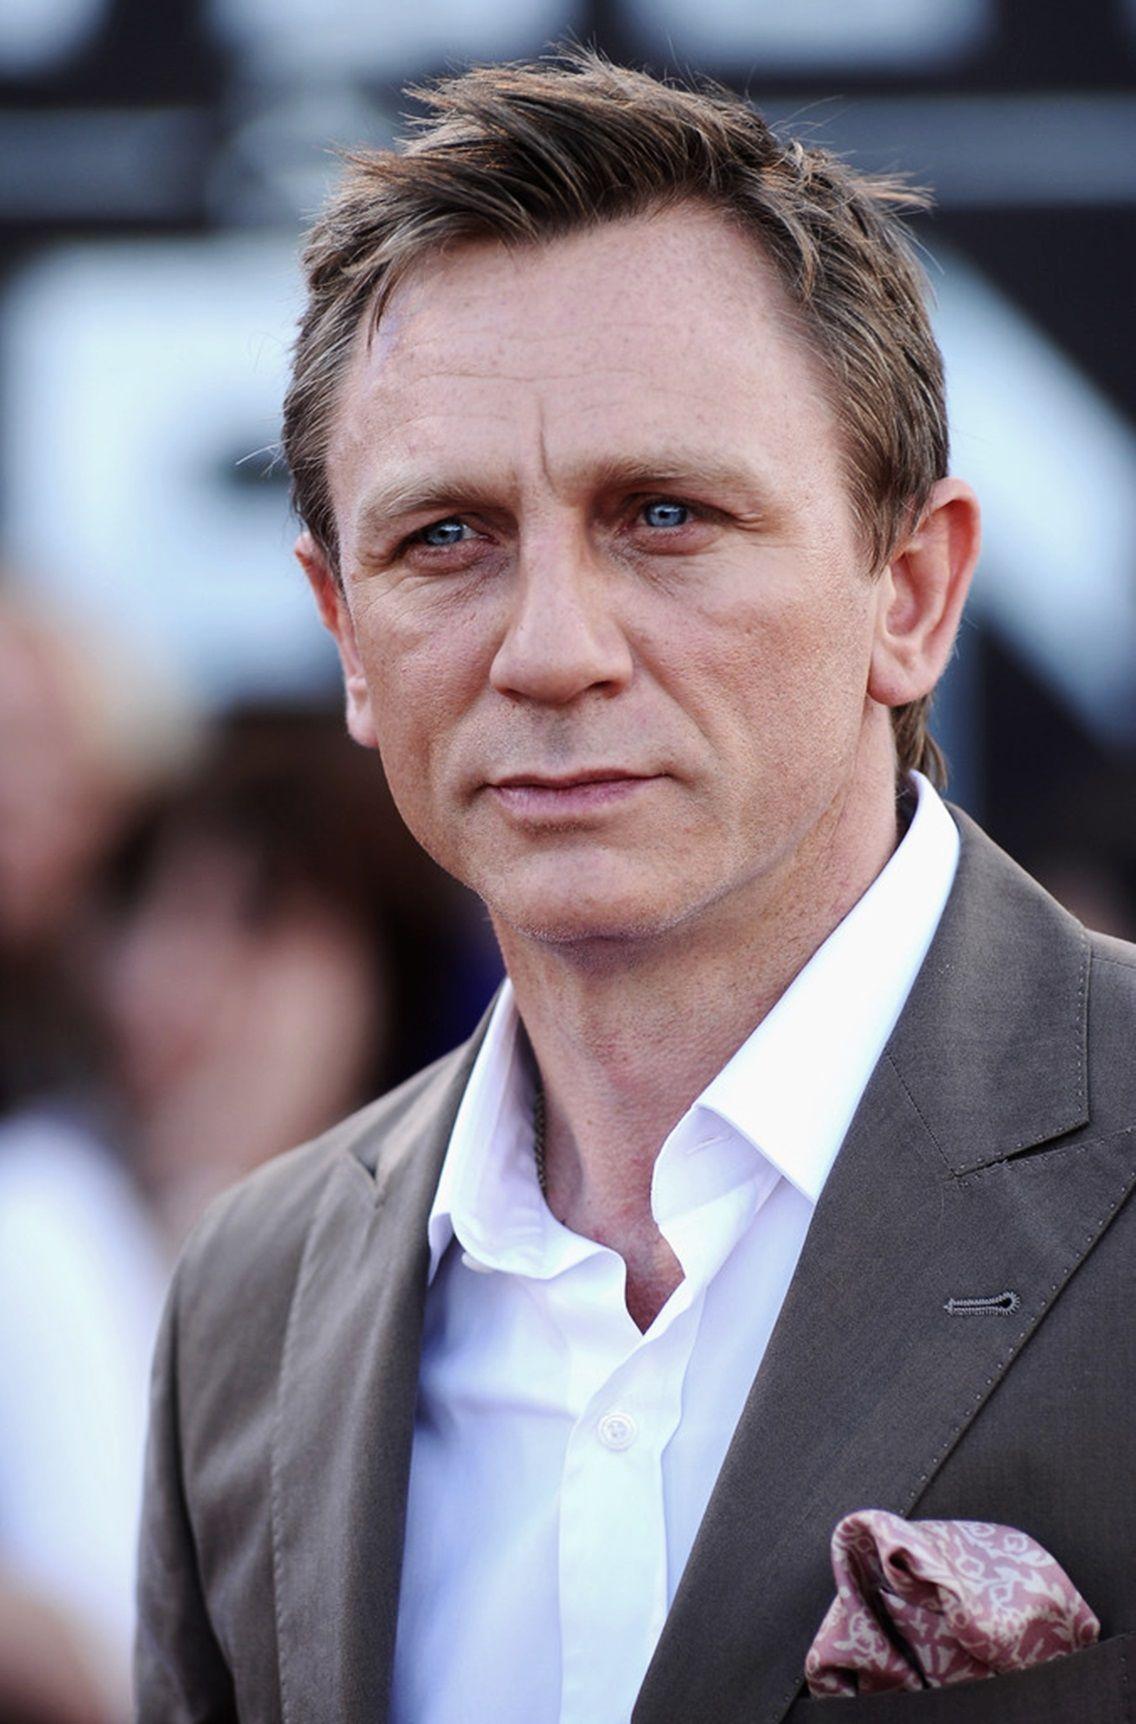 Daniel Craig (born 1968)